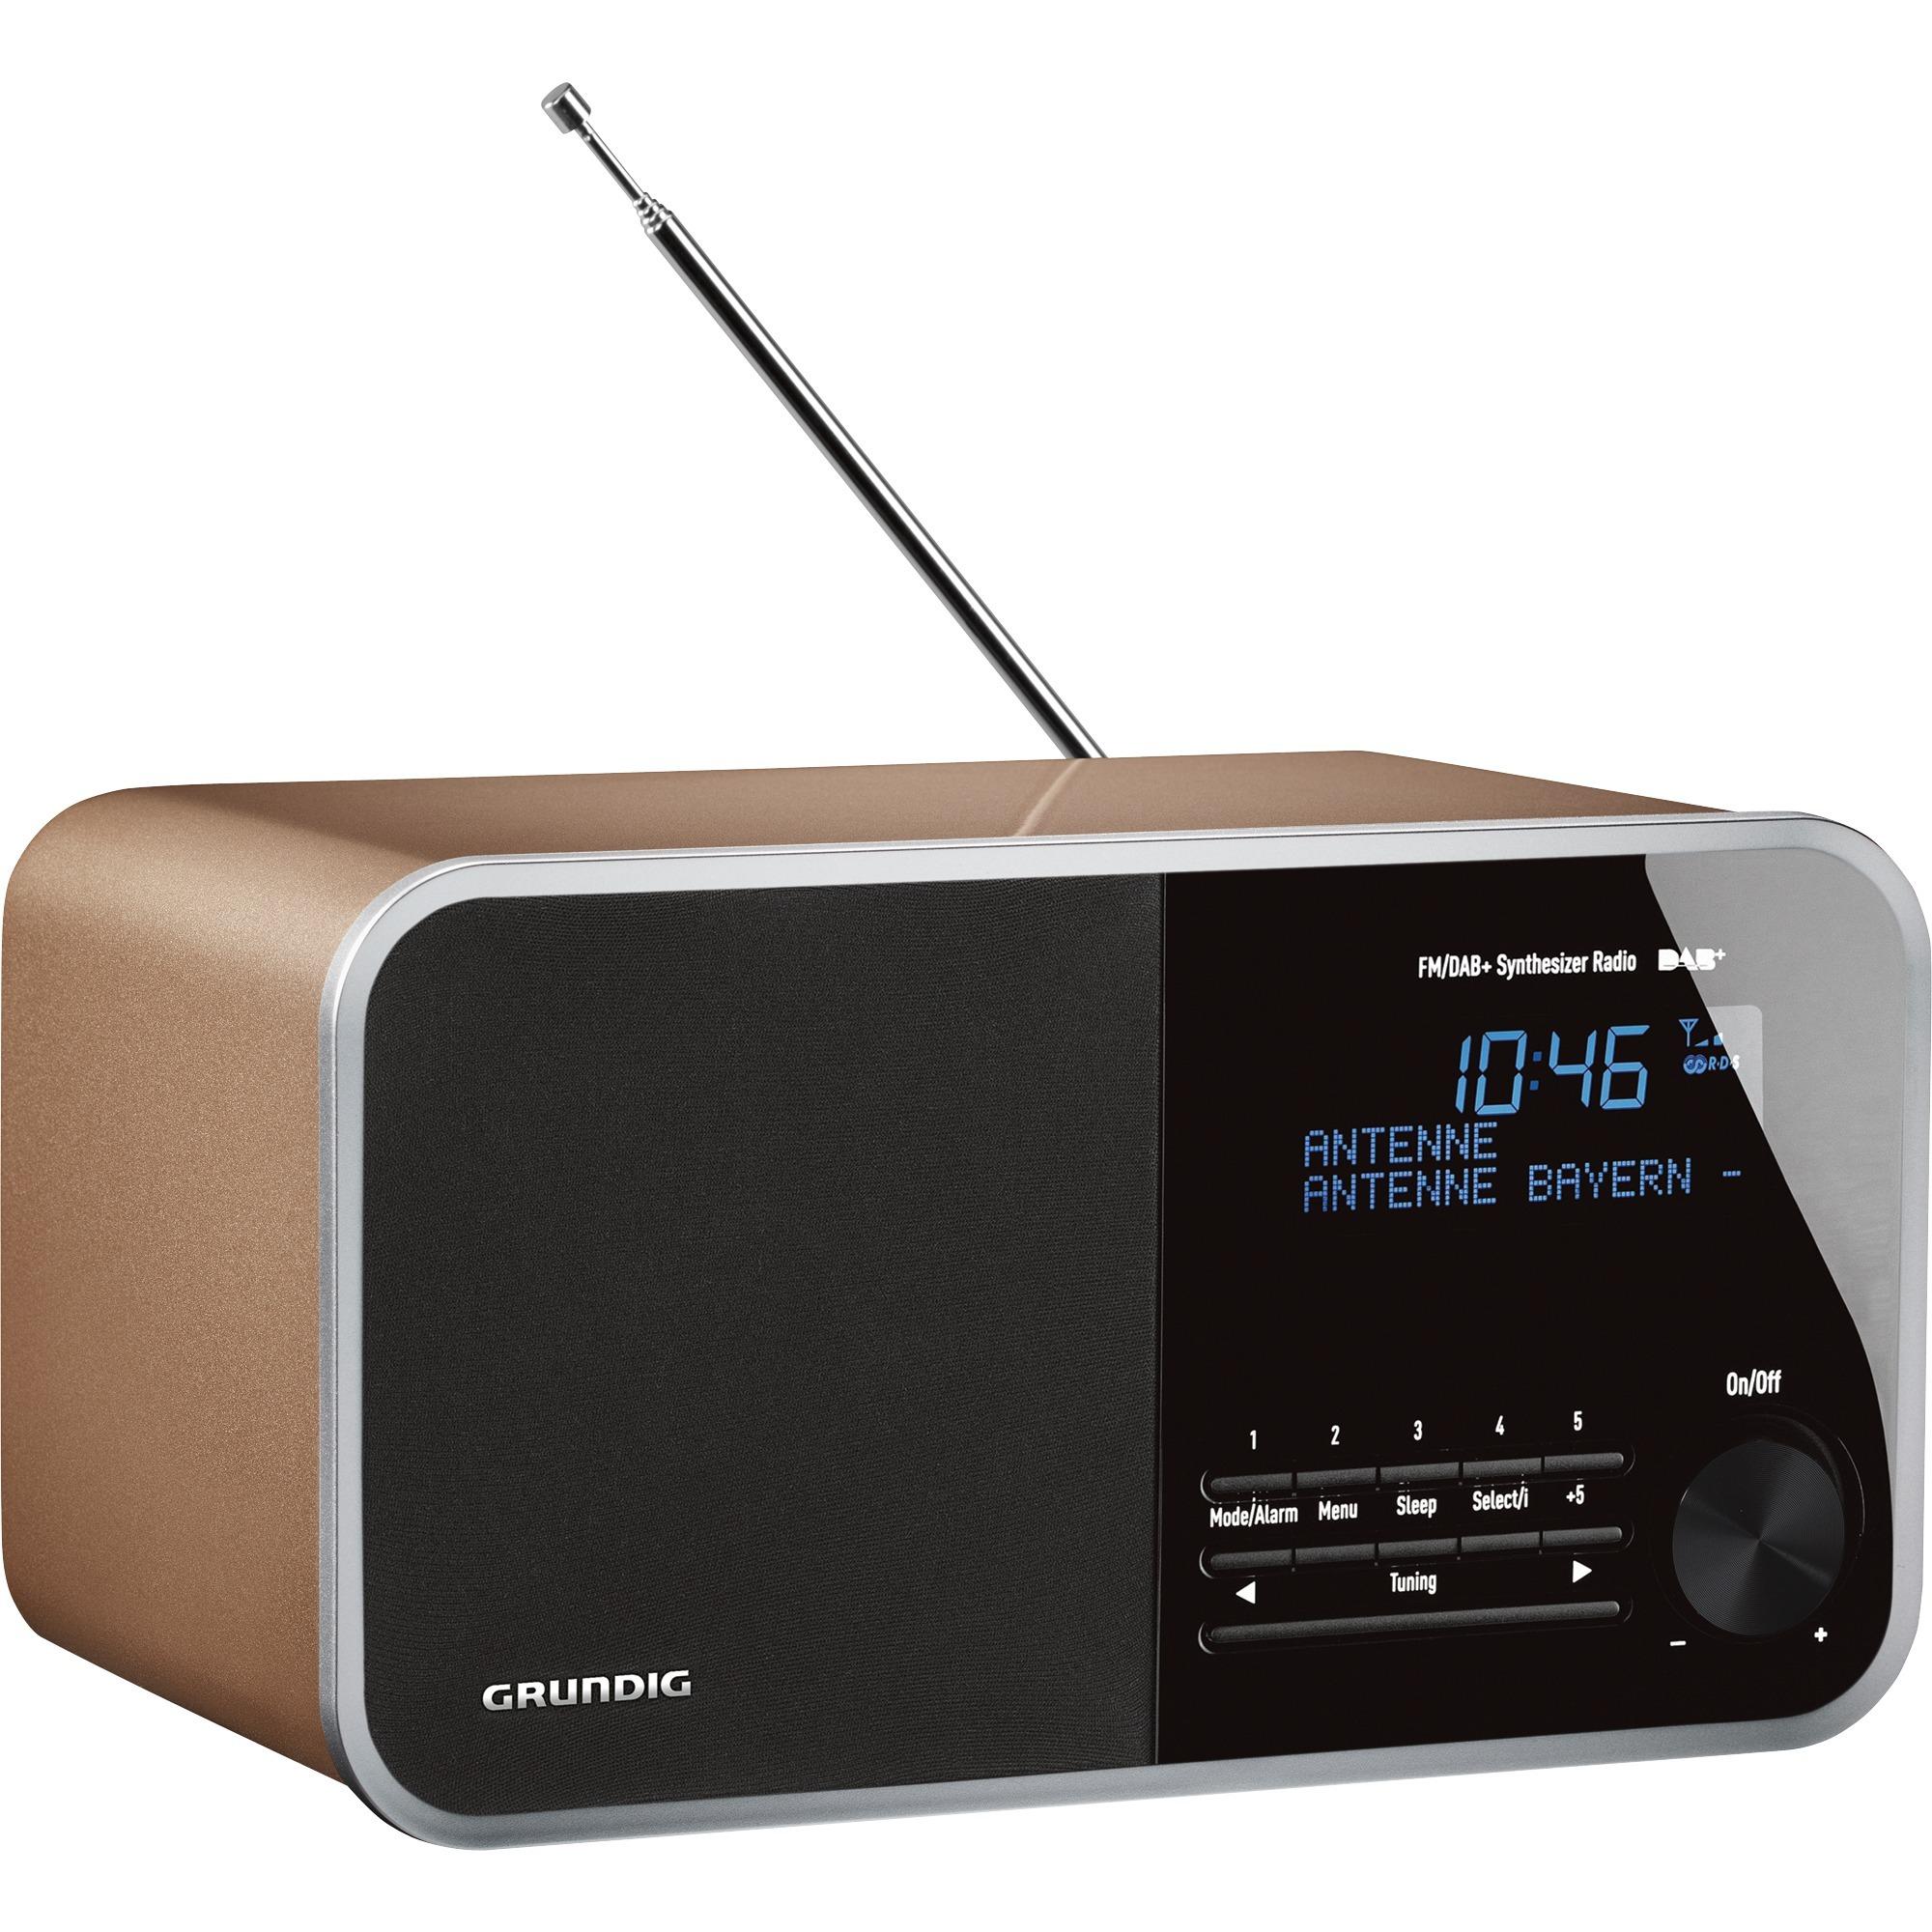 DTR 3000 DAB+ Personal Analógico y digital Madera radio